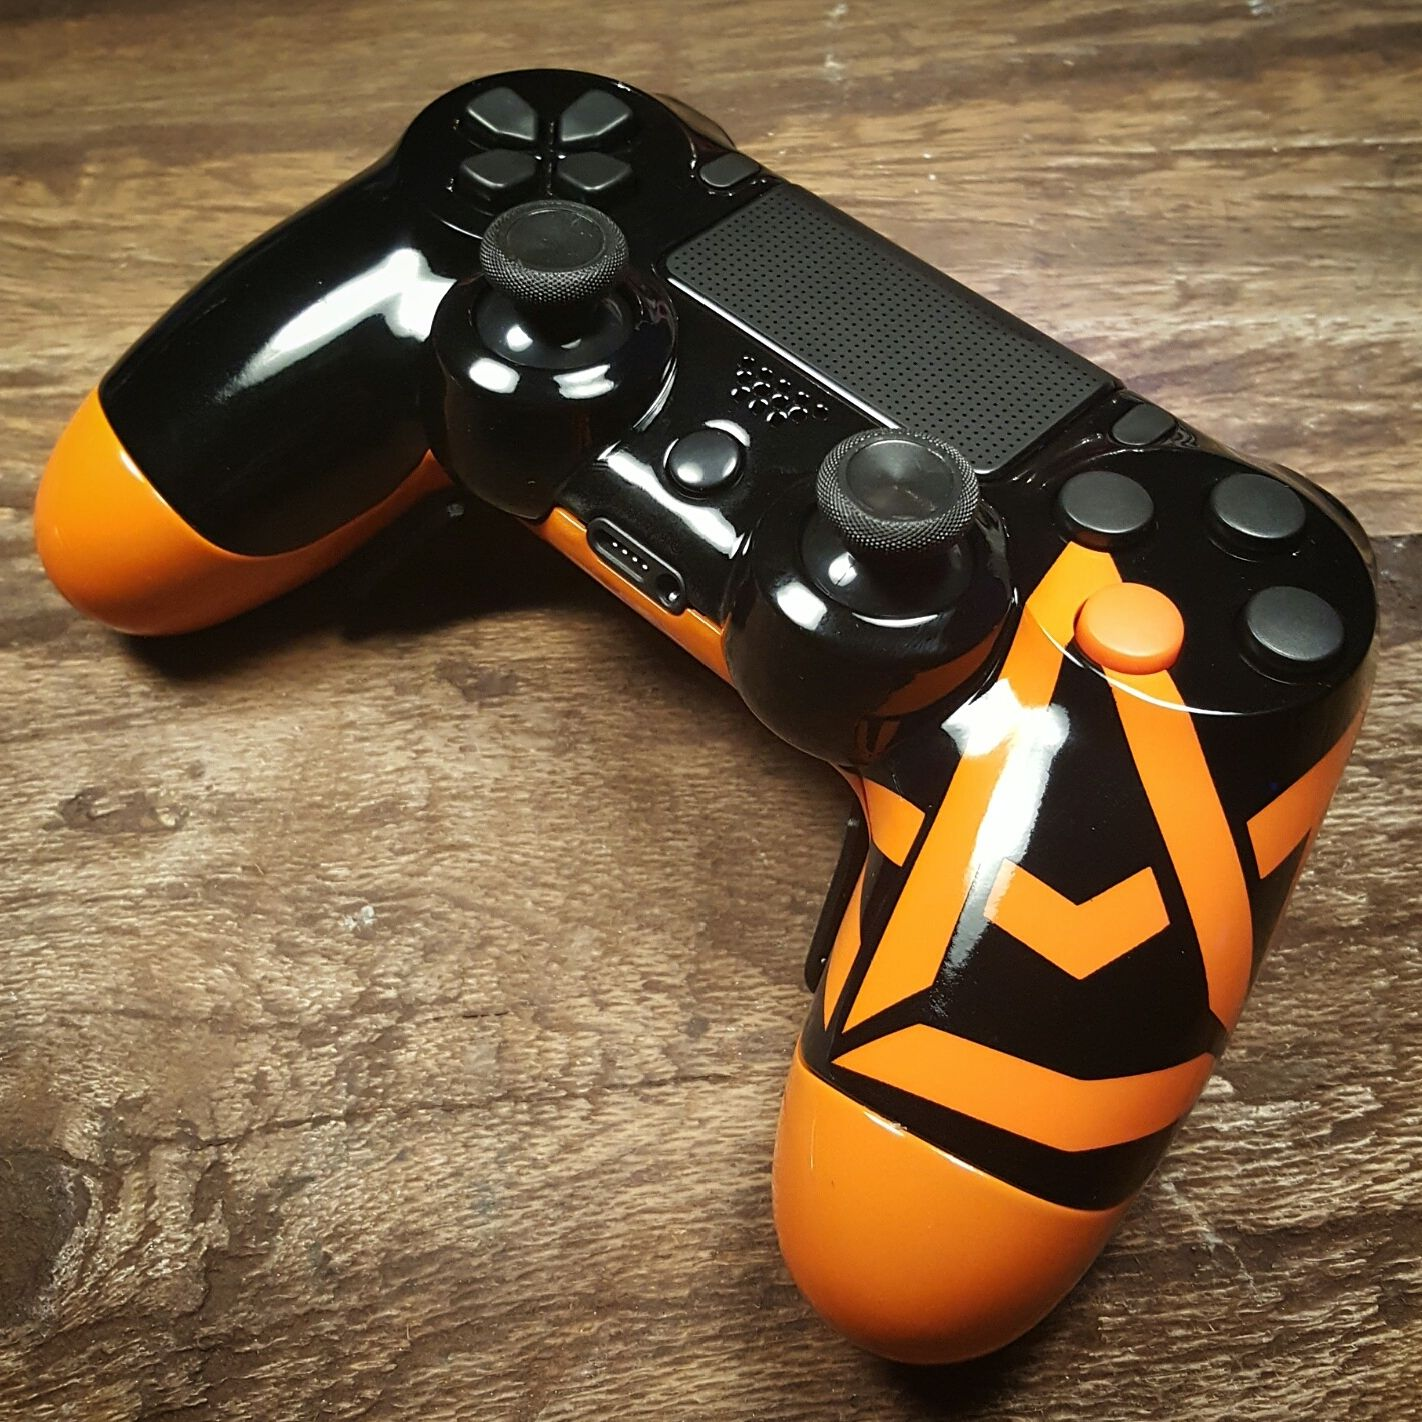 Ps4 Controller With Custom Paint Xbox One Sticks And Shock Paddles Ideias De Jogos Jogos De Video Game Ps4